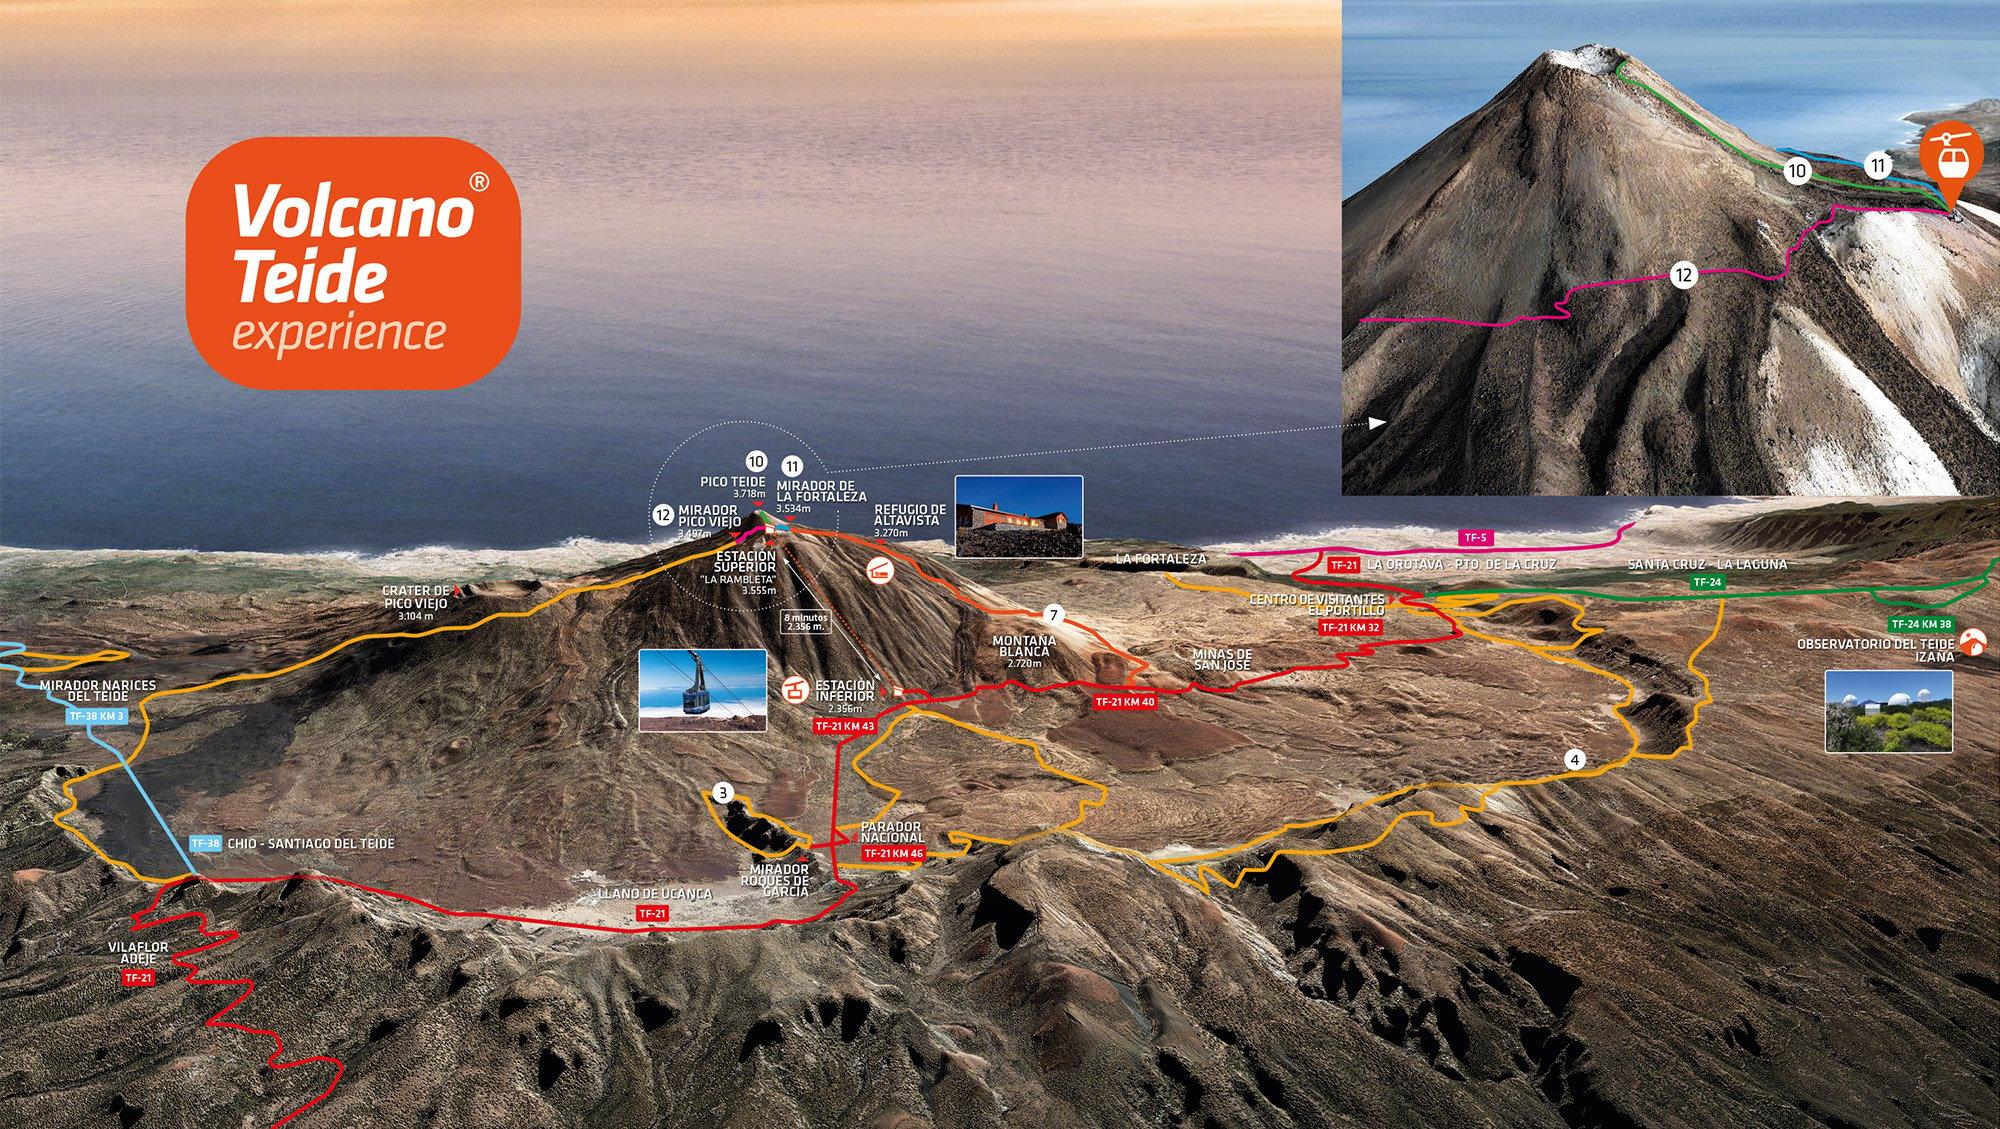 Salire sul Teide senza permesso: alternative